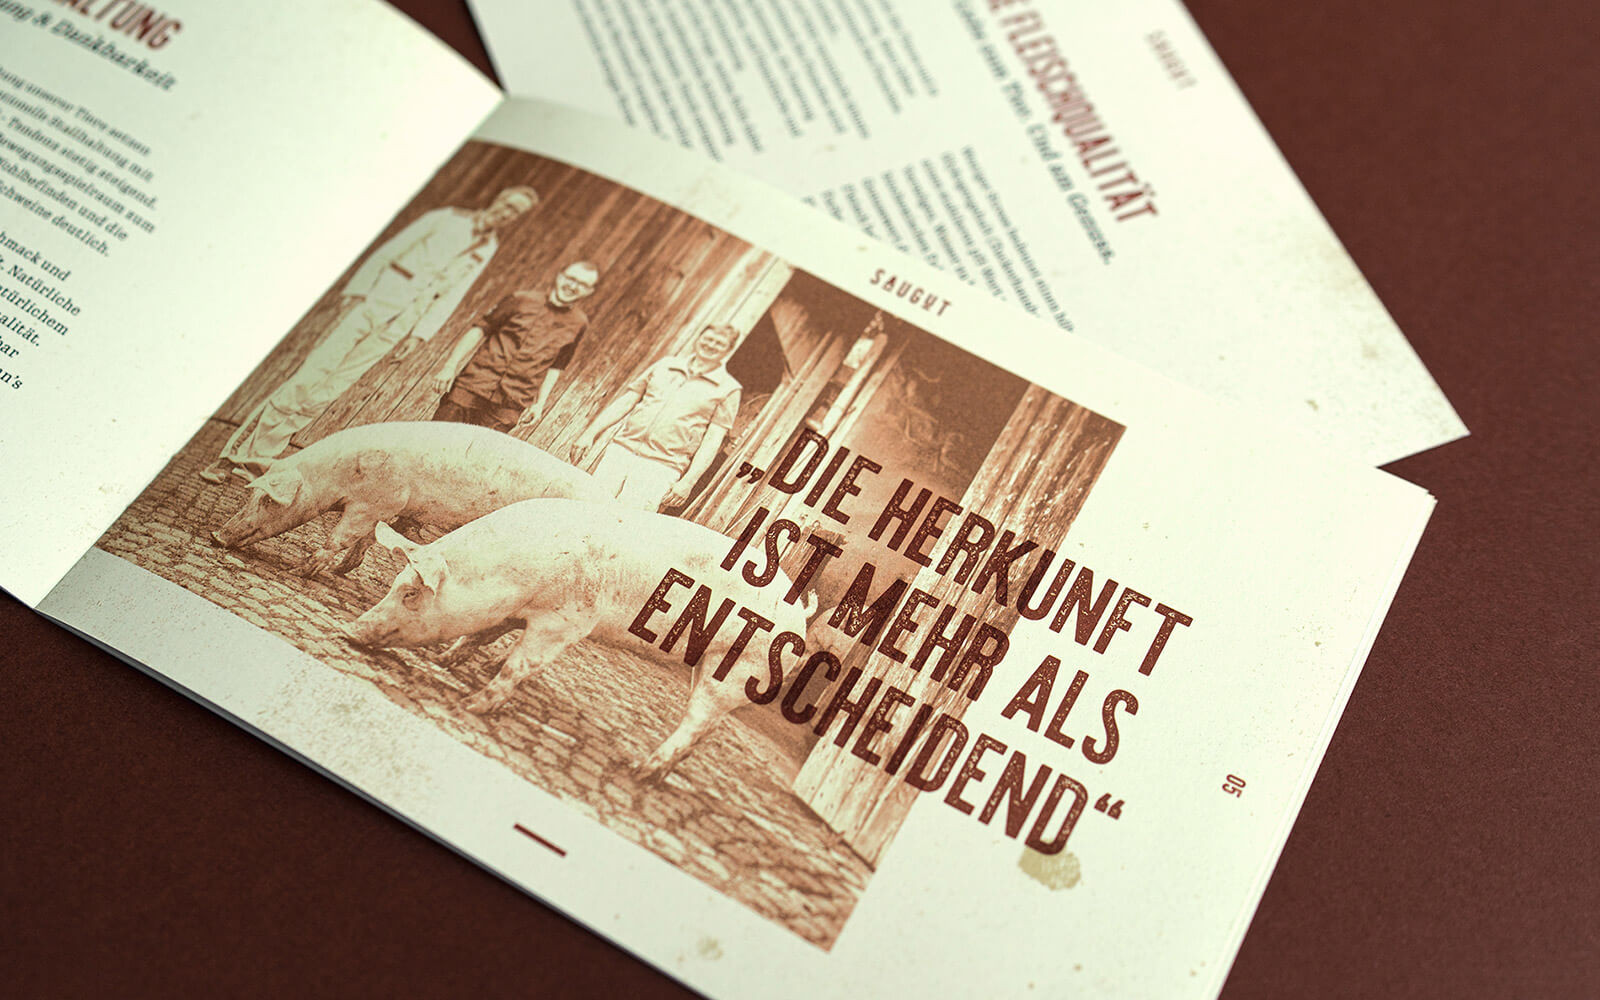 SAUGUT – Broschüre Innen